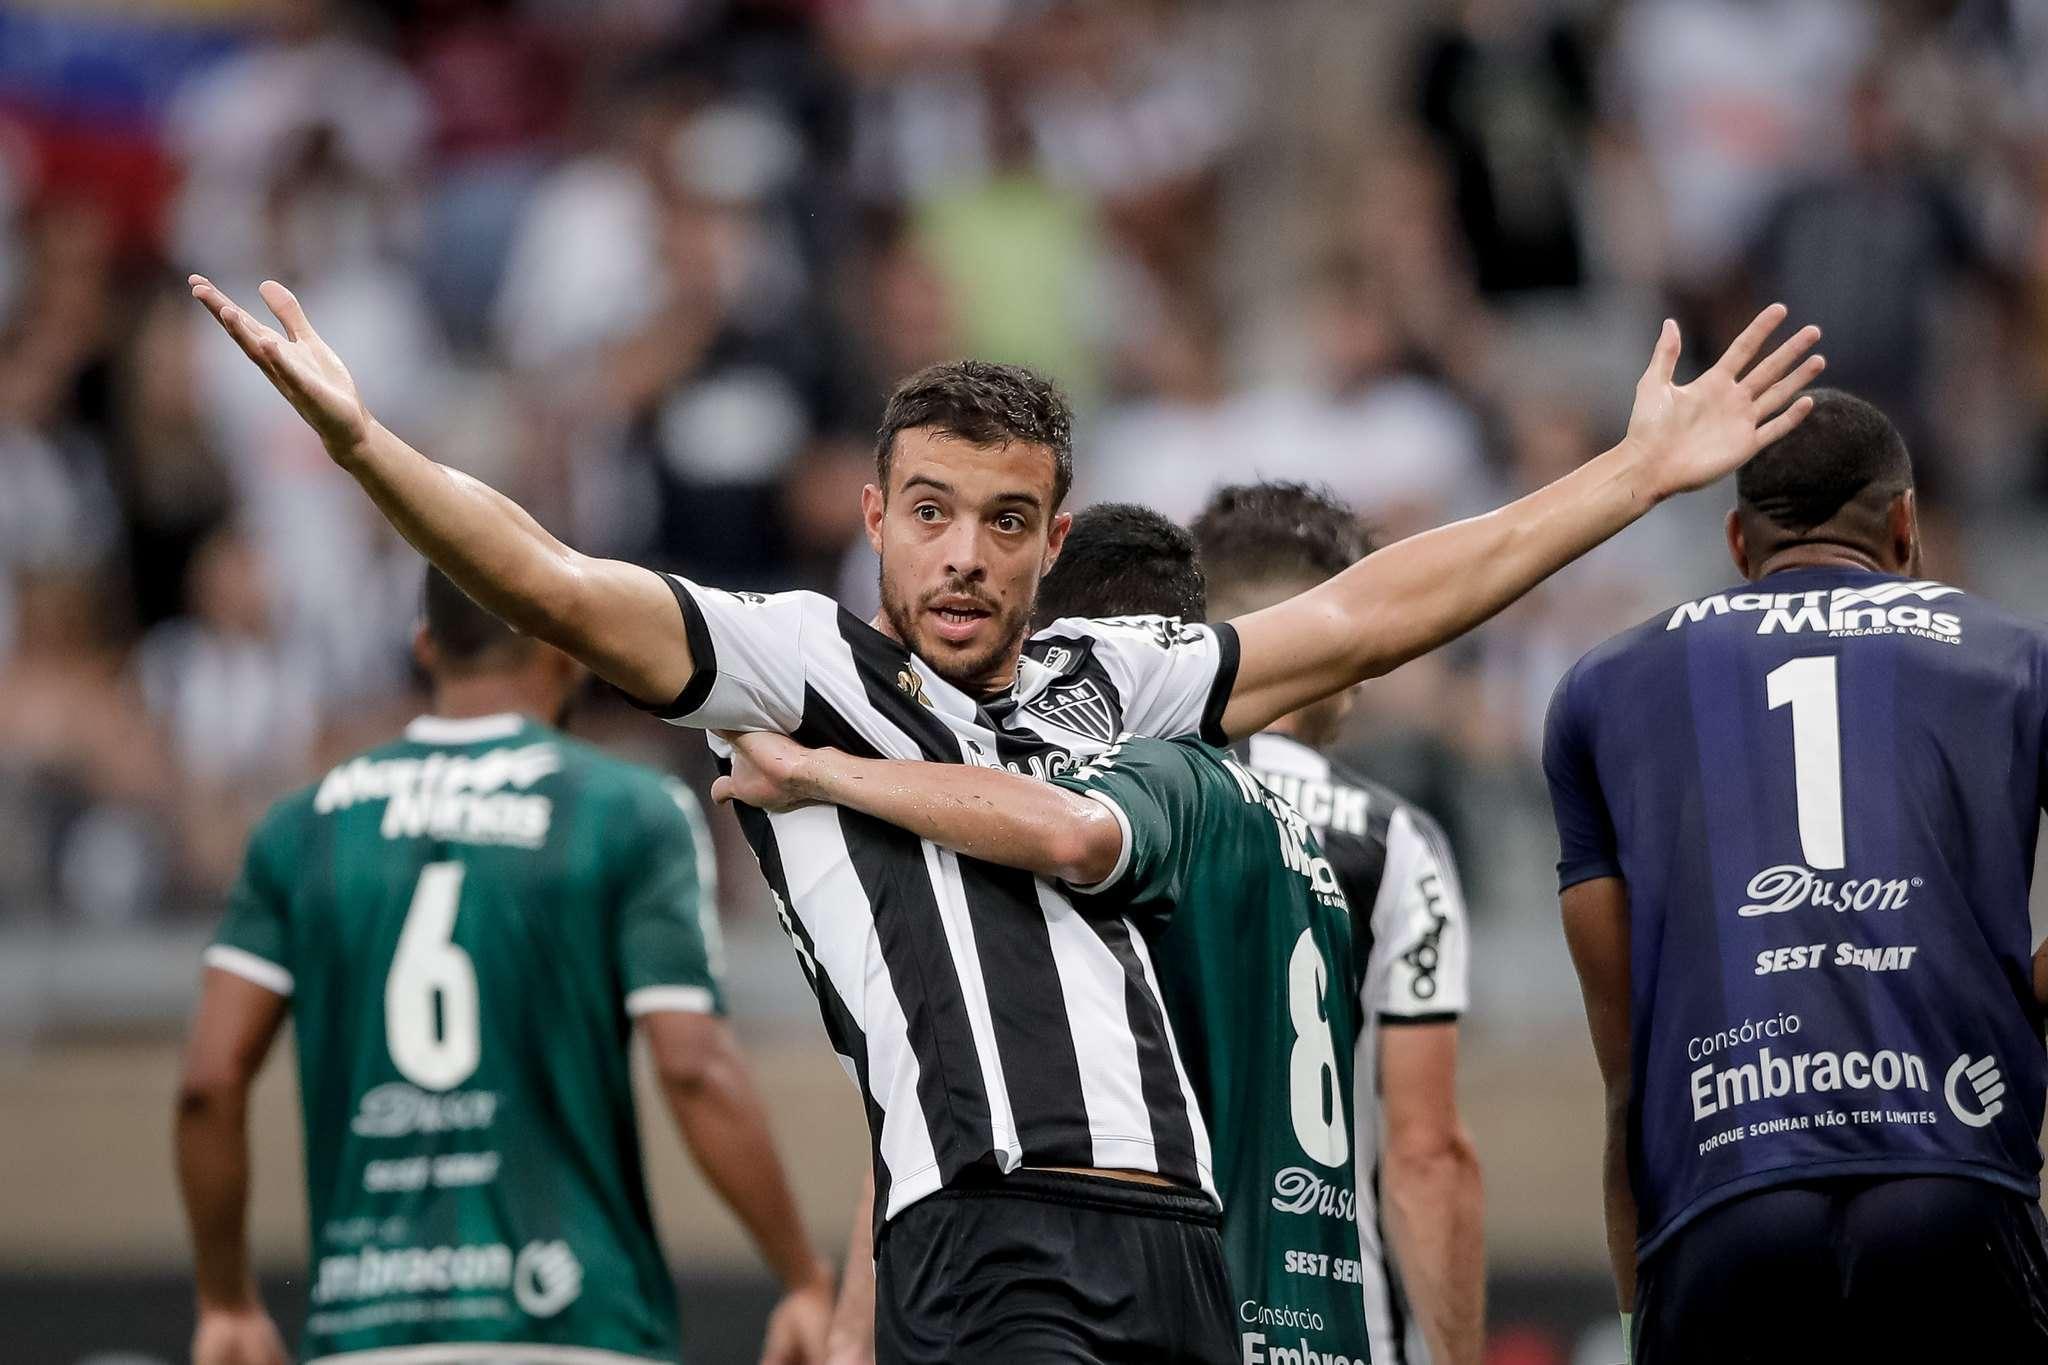 Foto: https://www.flickr.com/photos/clubeatleticomineiro/49544845798/ Flickr Atlético